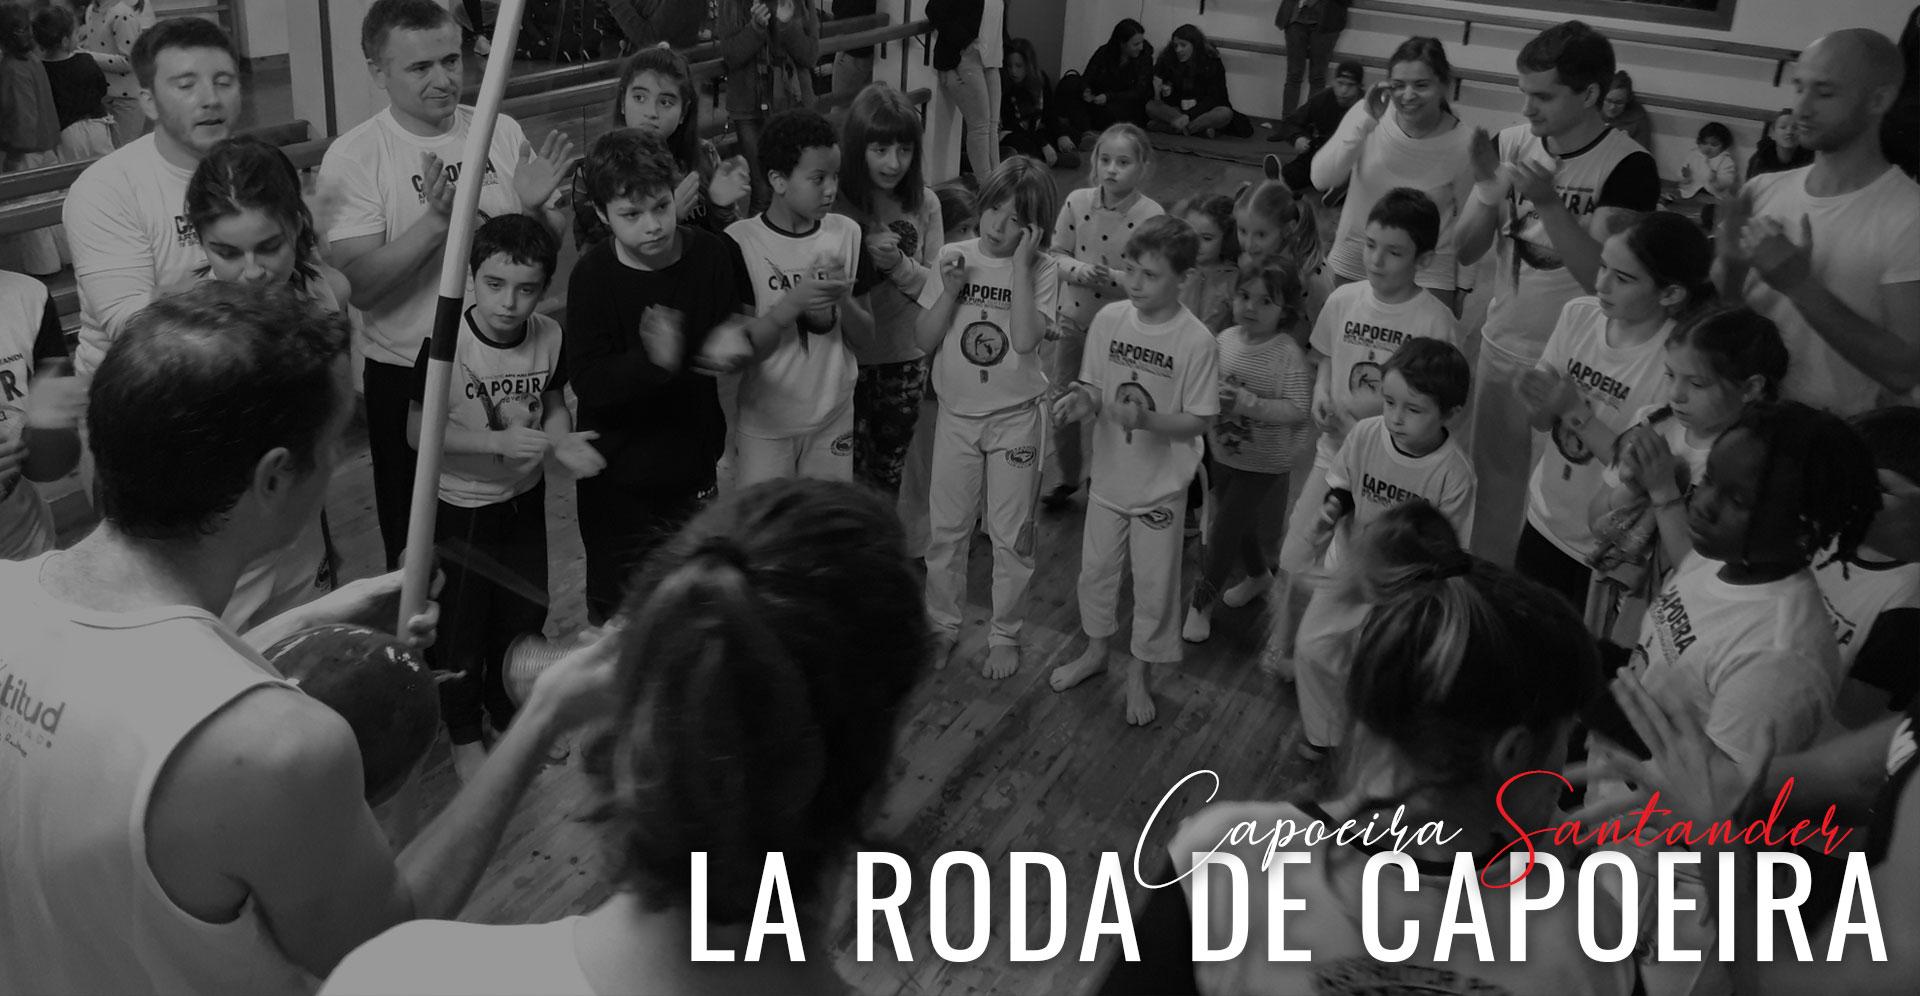 cabe-pc-roda-de-capoeira-santander-clases-capoeira-cantabria-01